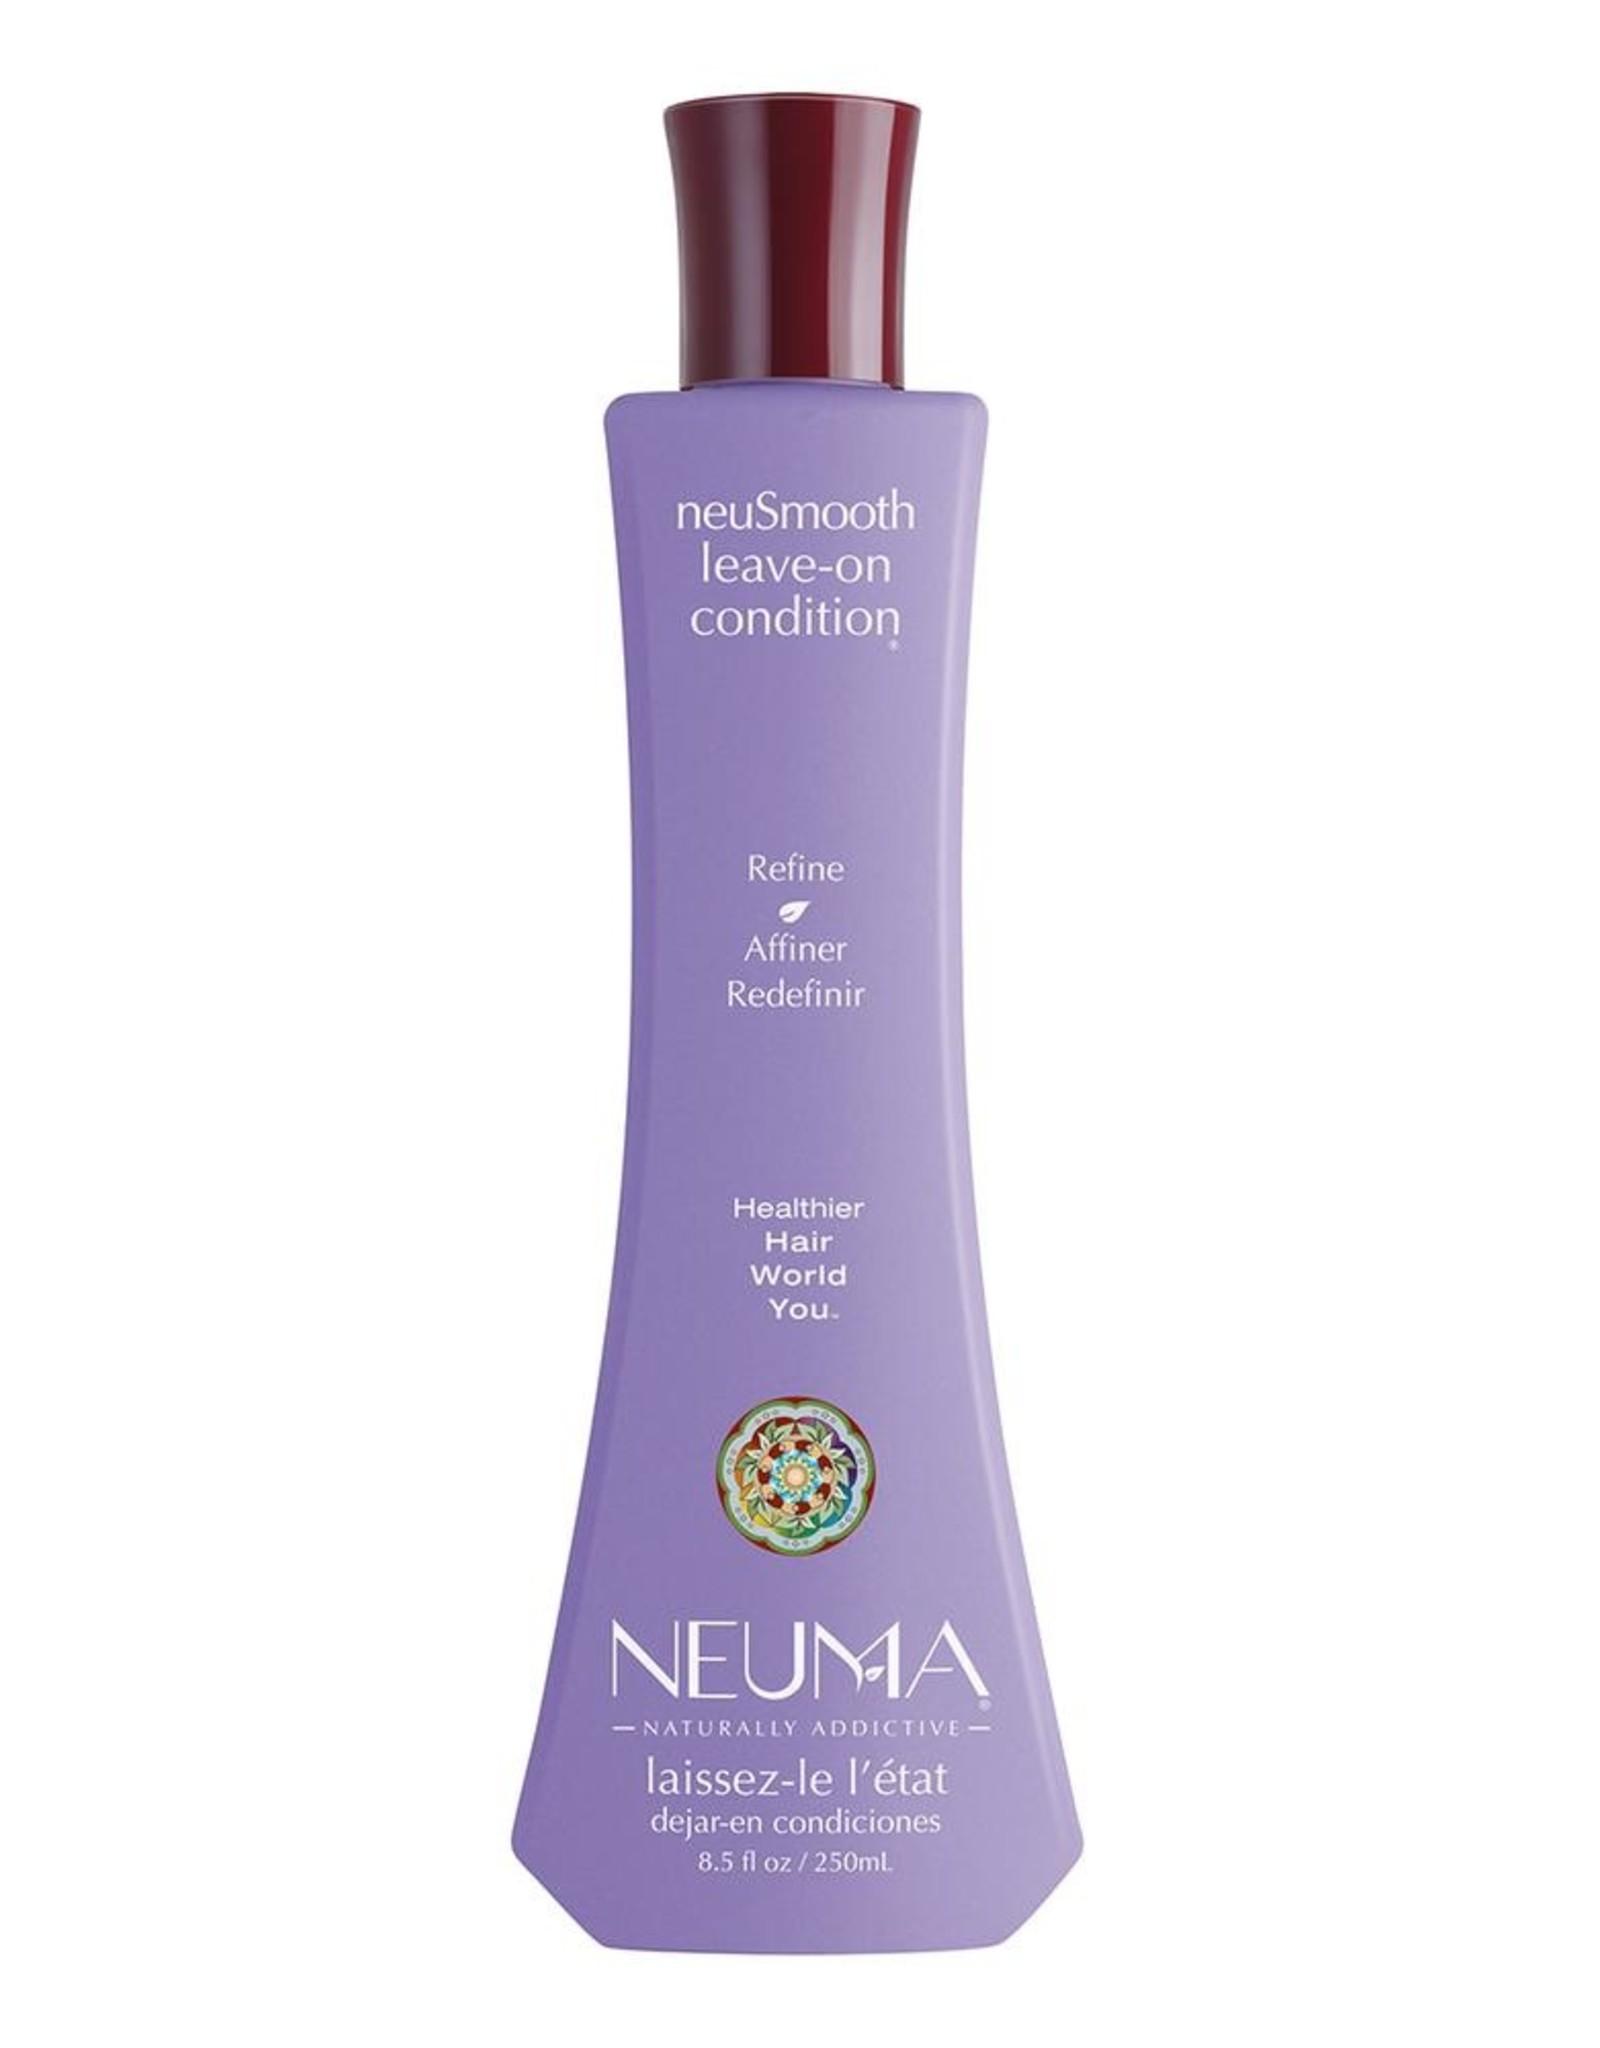 Neuma neuSmooth Condition